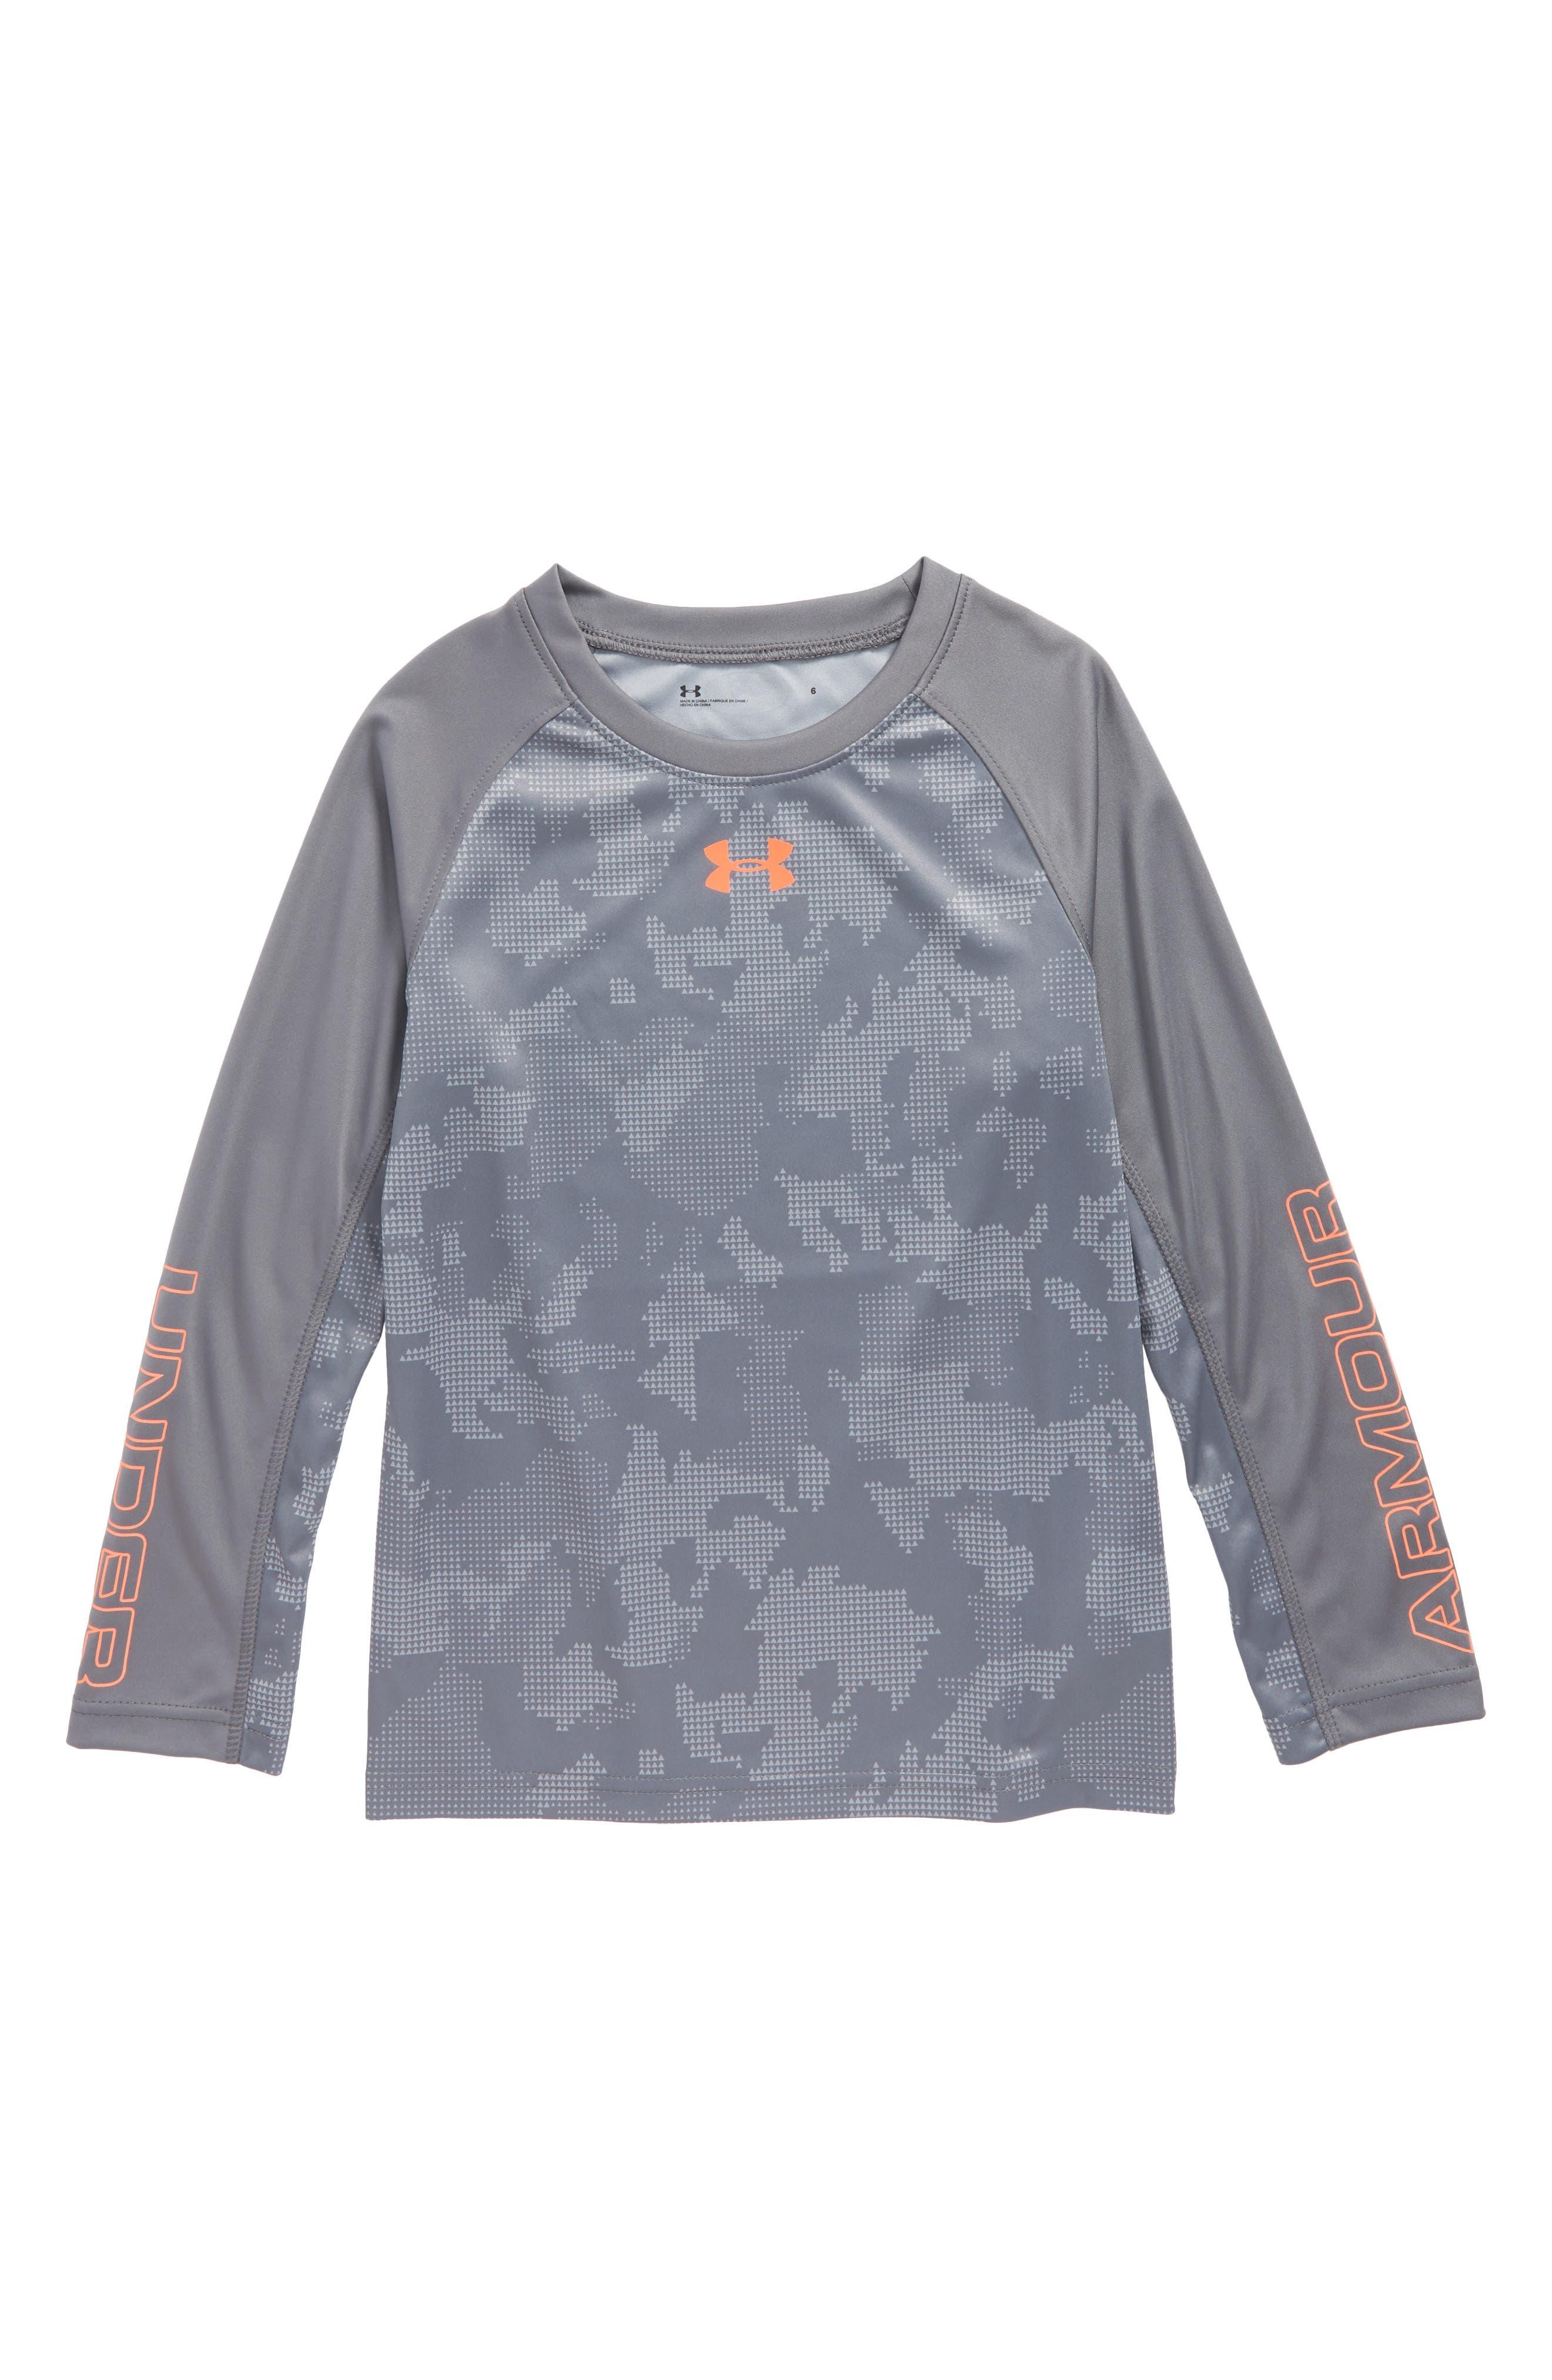 Under Armour Utility Raglan Long Sleeve T-Shirt (Toddler Boys & Little Boys)